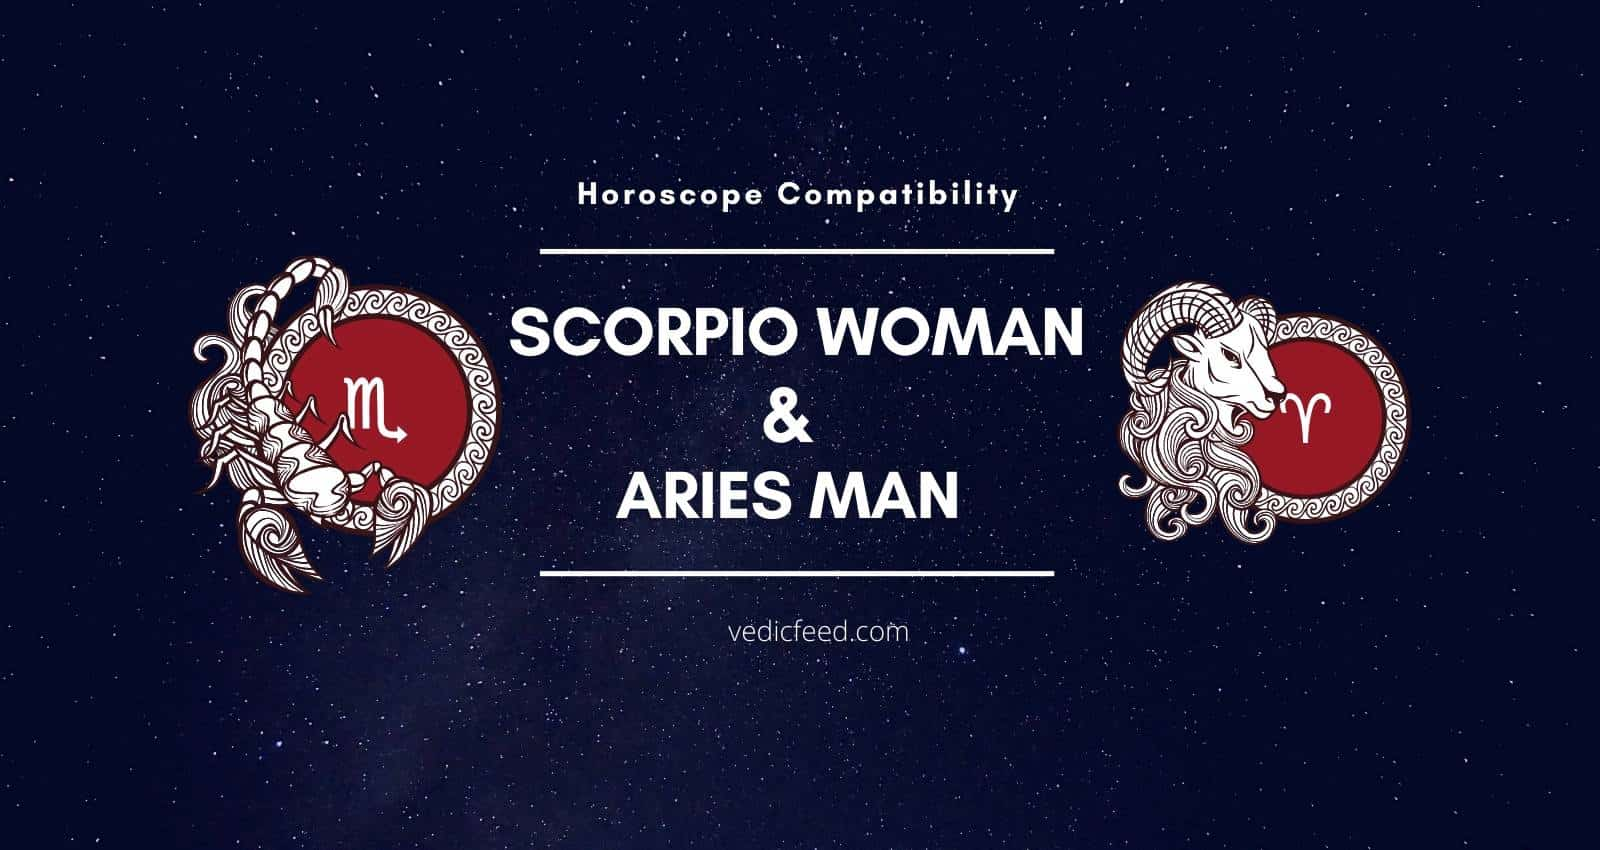 Scorpio Woman and Aries Man